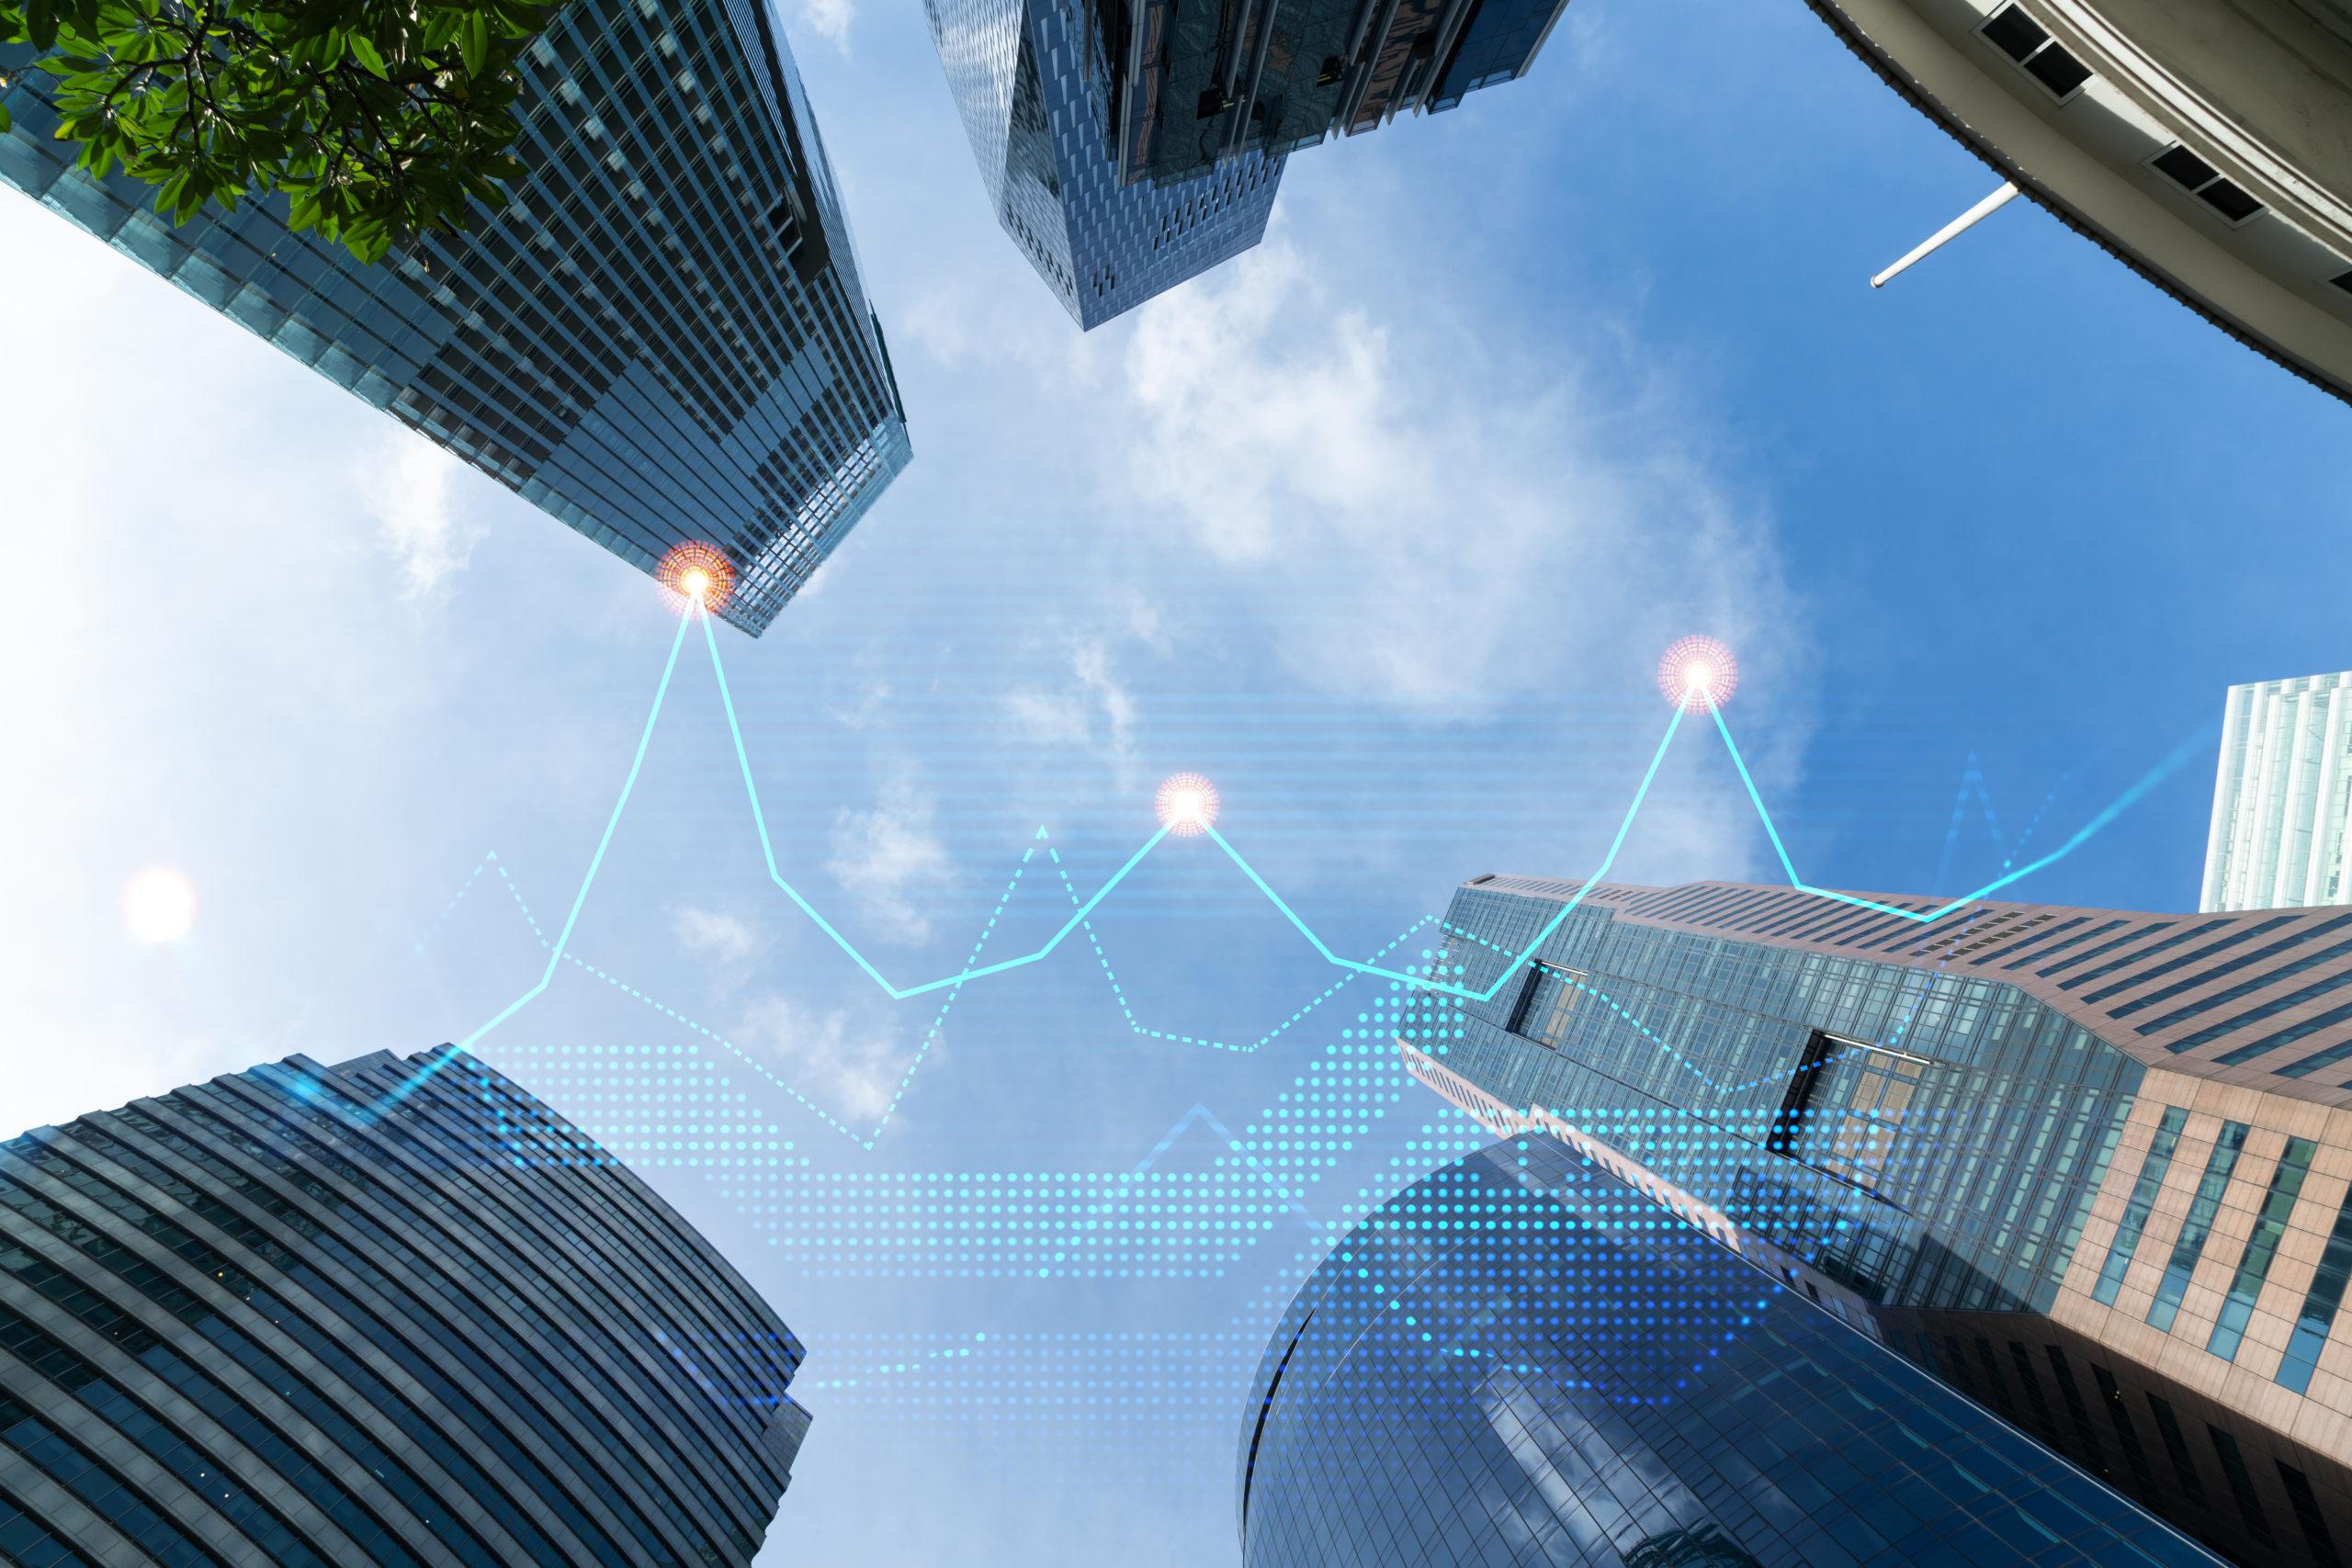 Financial stock chart hologram